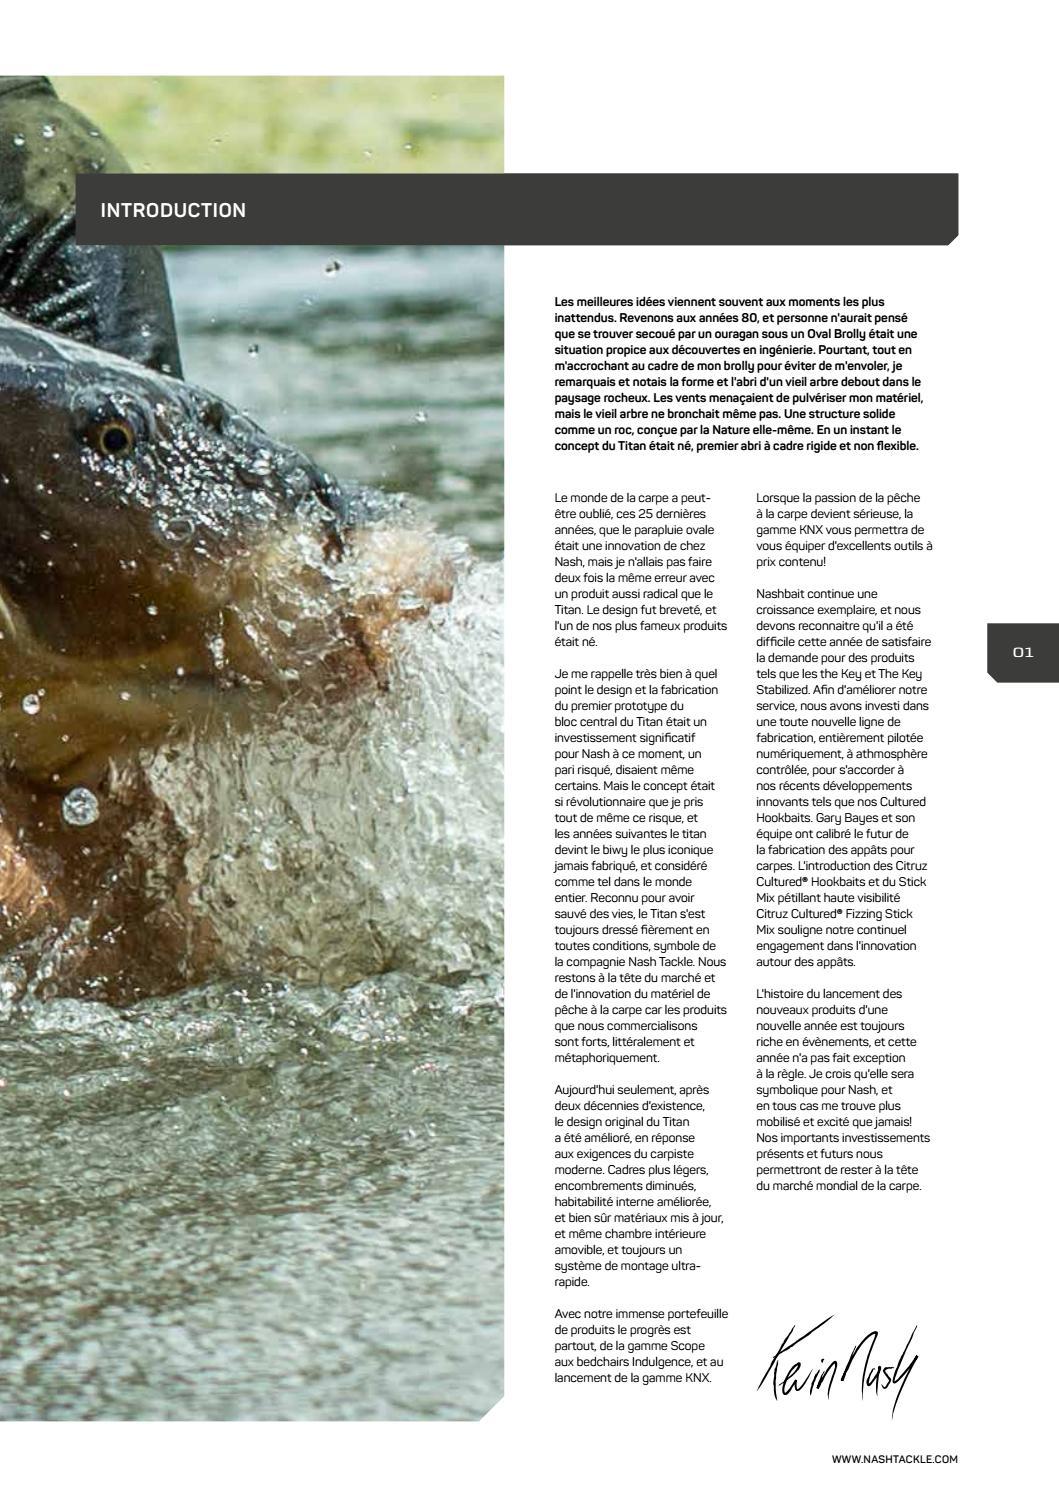 Nash Diffusion Camo Leader 1.5m T8149 Carp Fishing for sale online